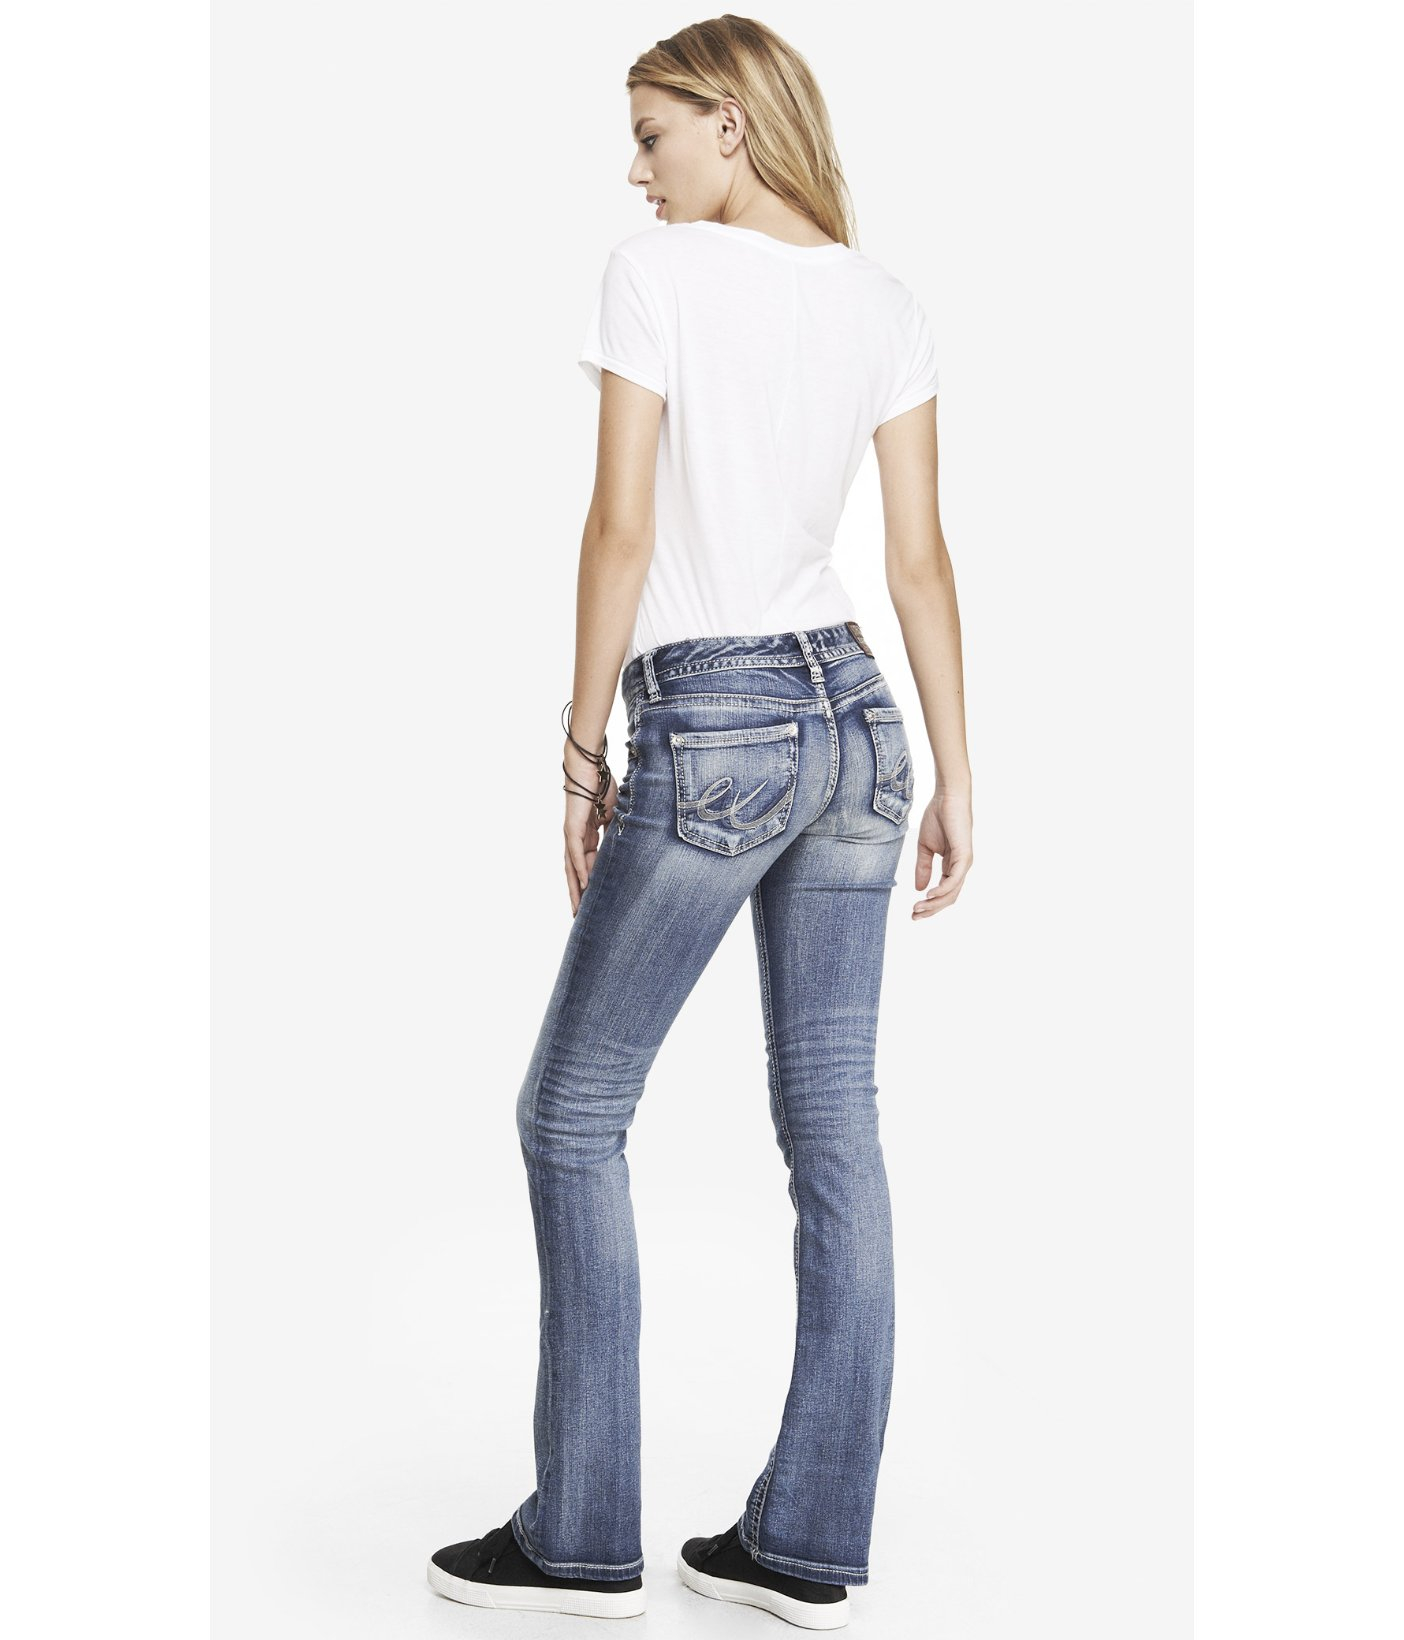 Good Jean Brands For Women